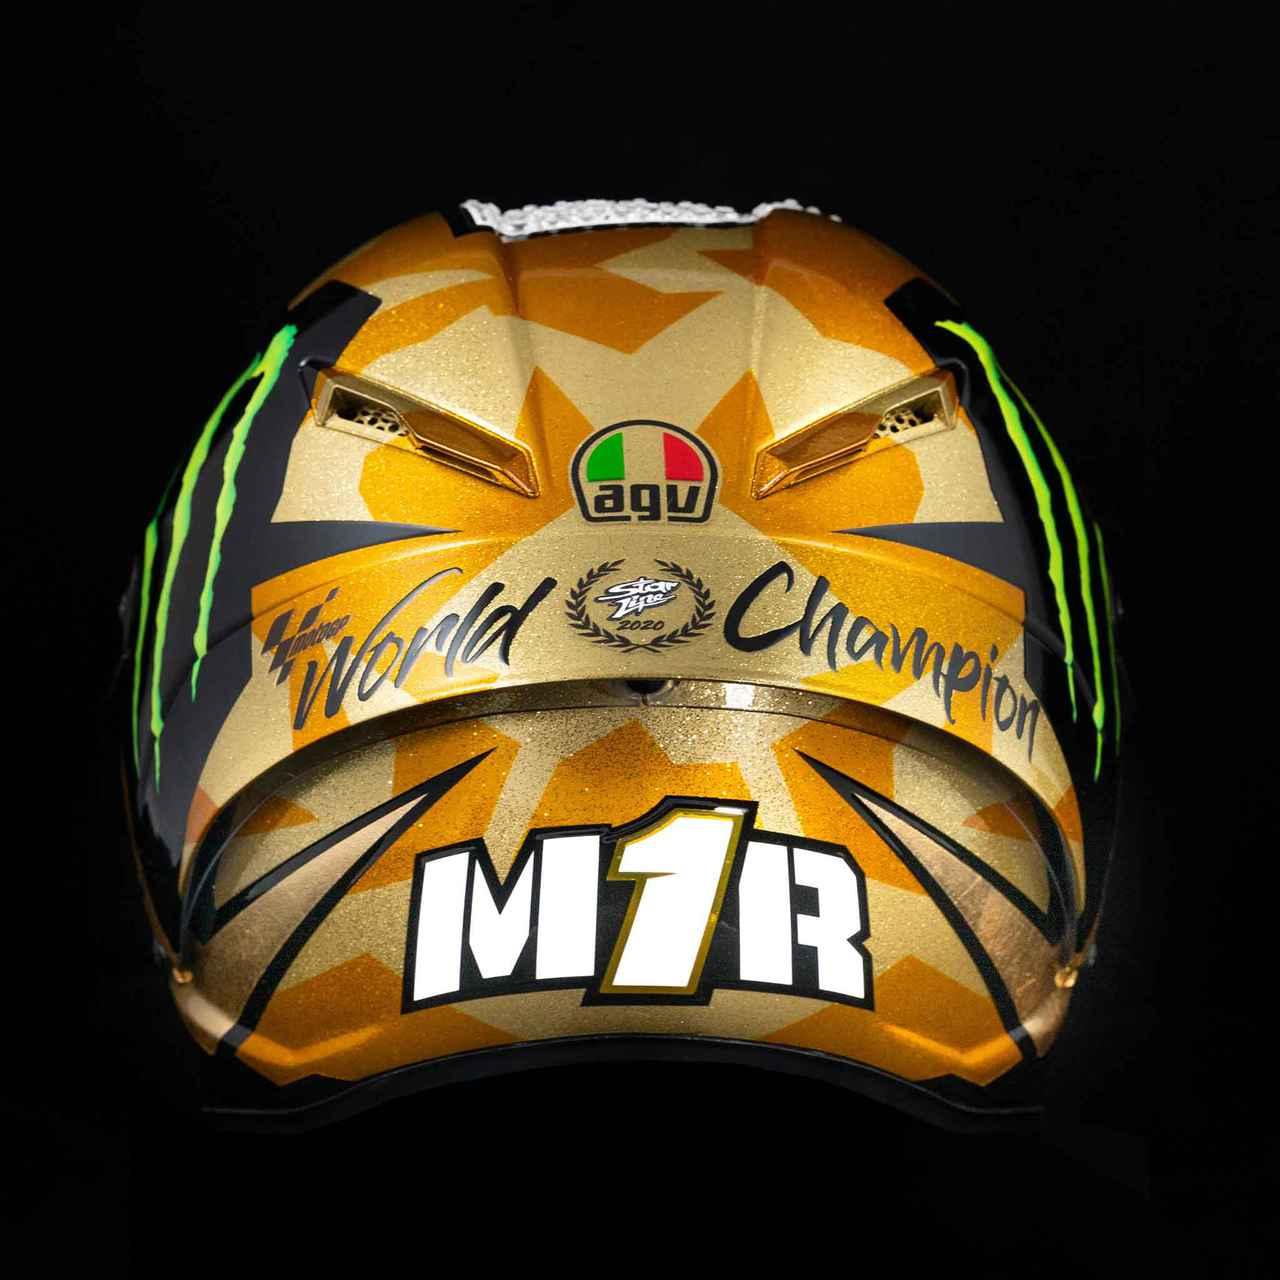 Images : 3番目の画像 - AGV PISTA GP RR 012-MIR WORLD CHAMPION 2020 - webオートバイ